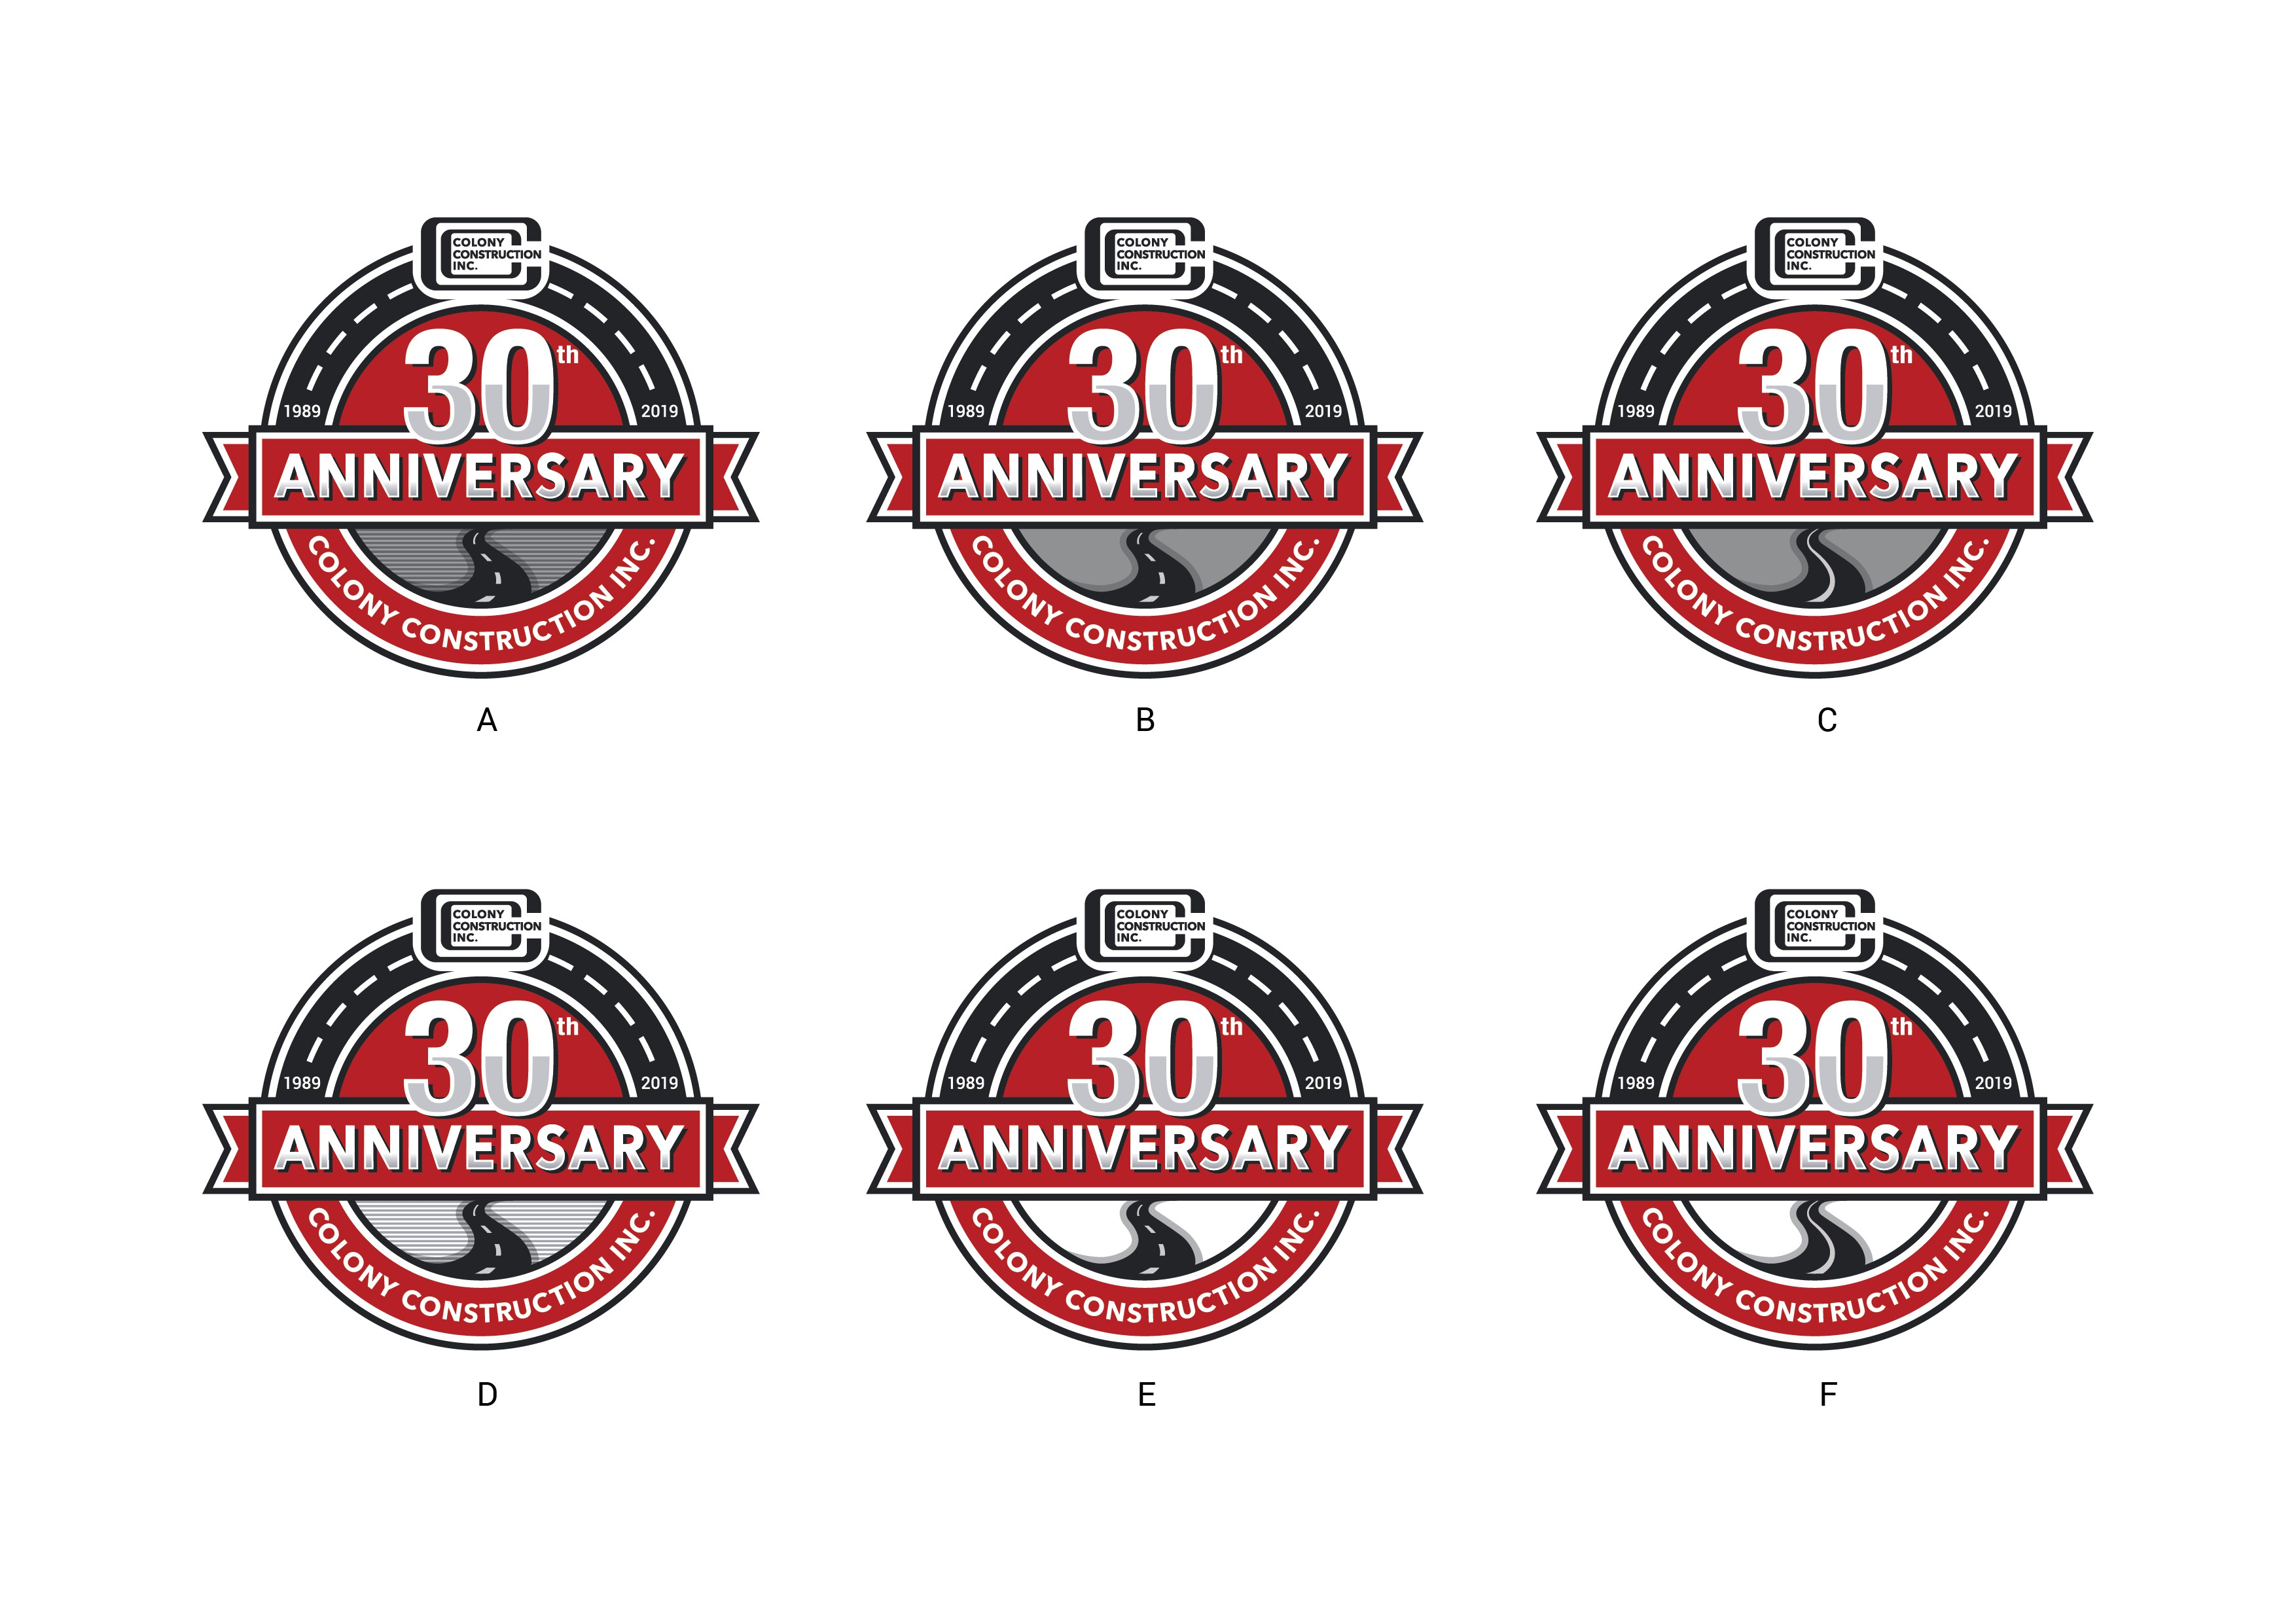 Asphalt paving company Colony Construction, Inc. needs a 30th Anniversary logo